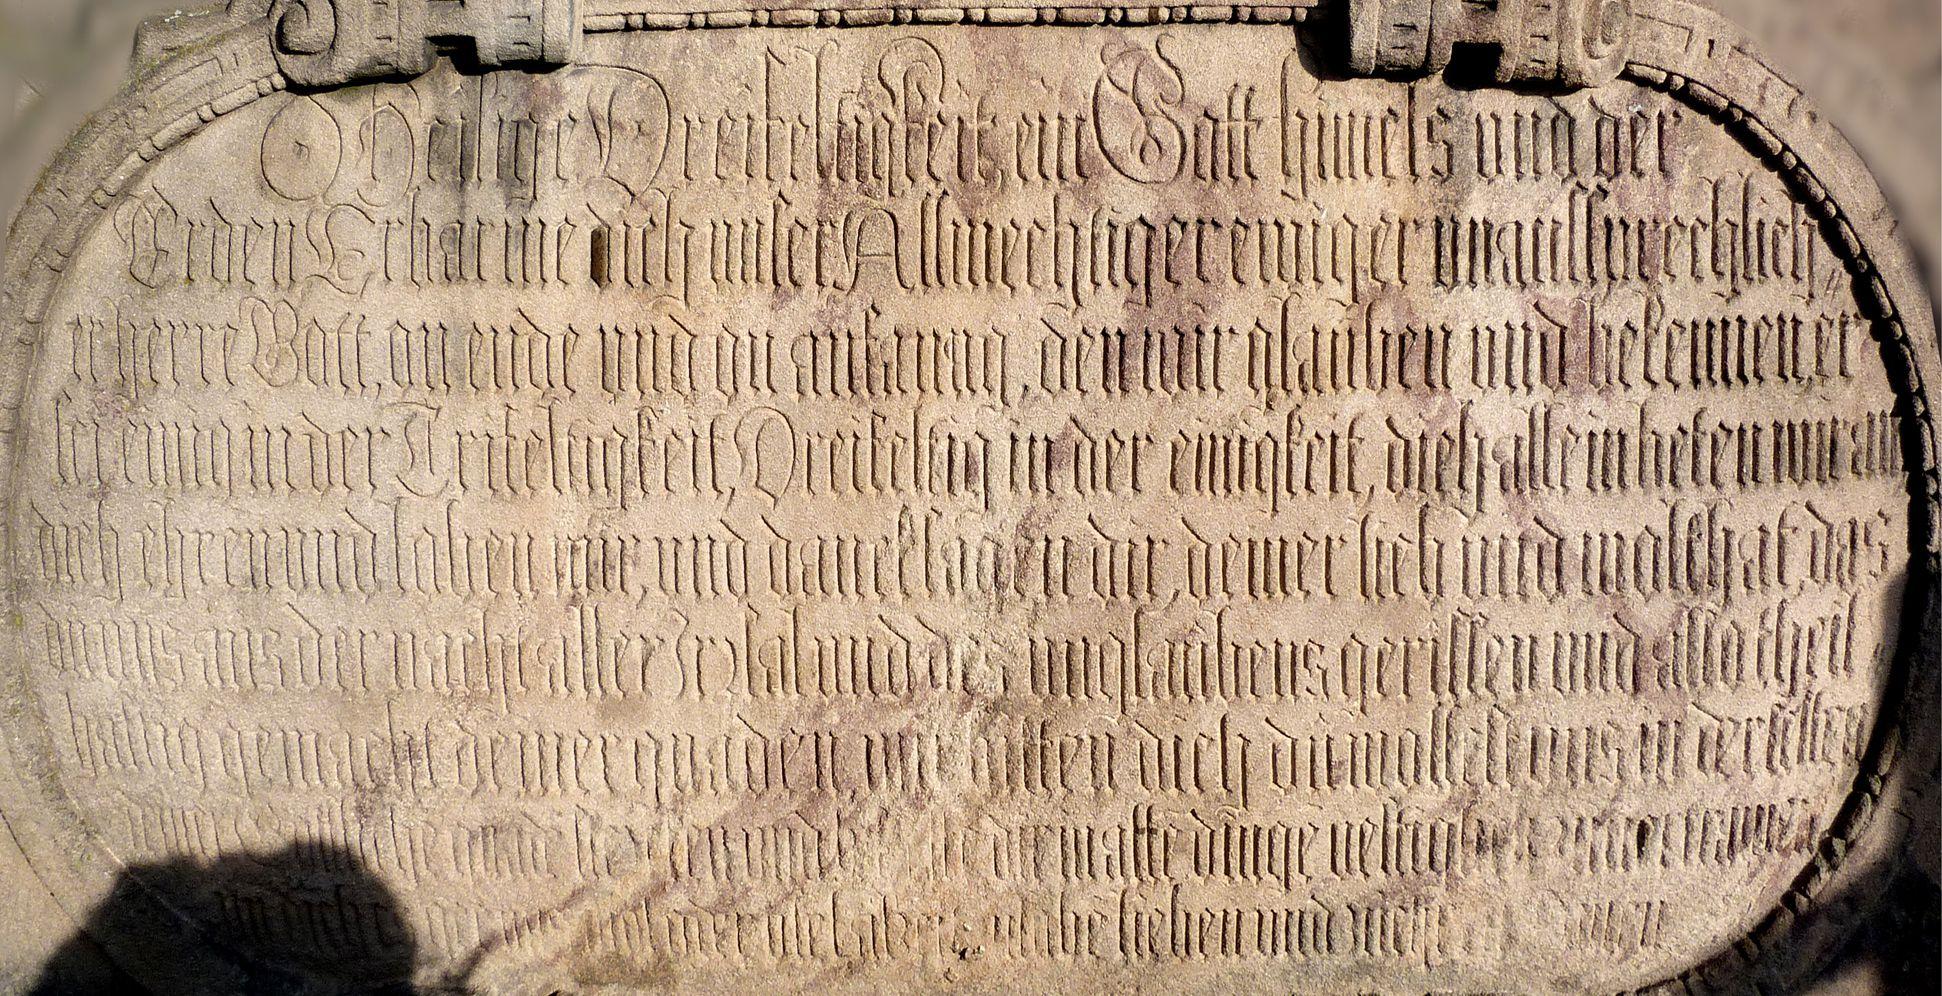 Gedächtnisstein des Wolfgang Münzer Basis, Inschrift, Frontal